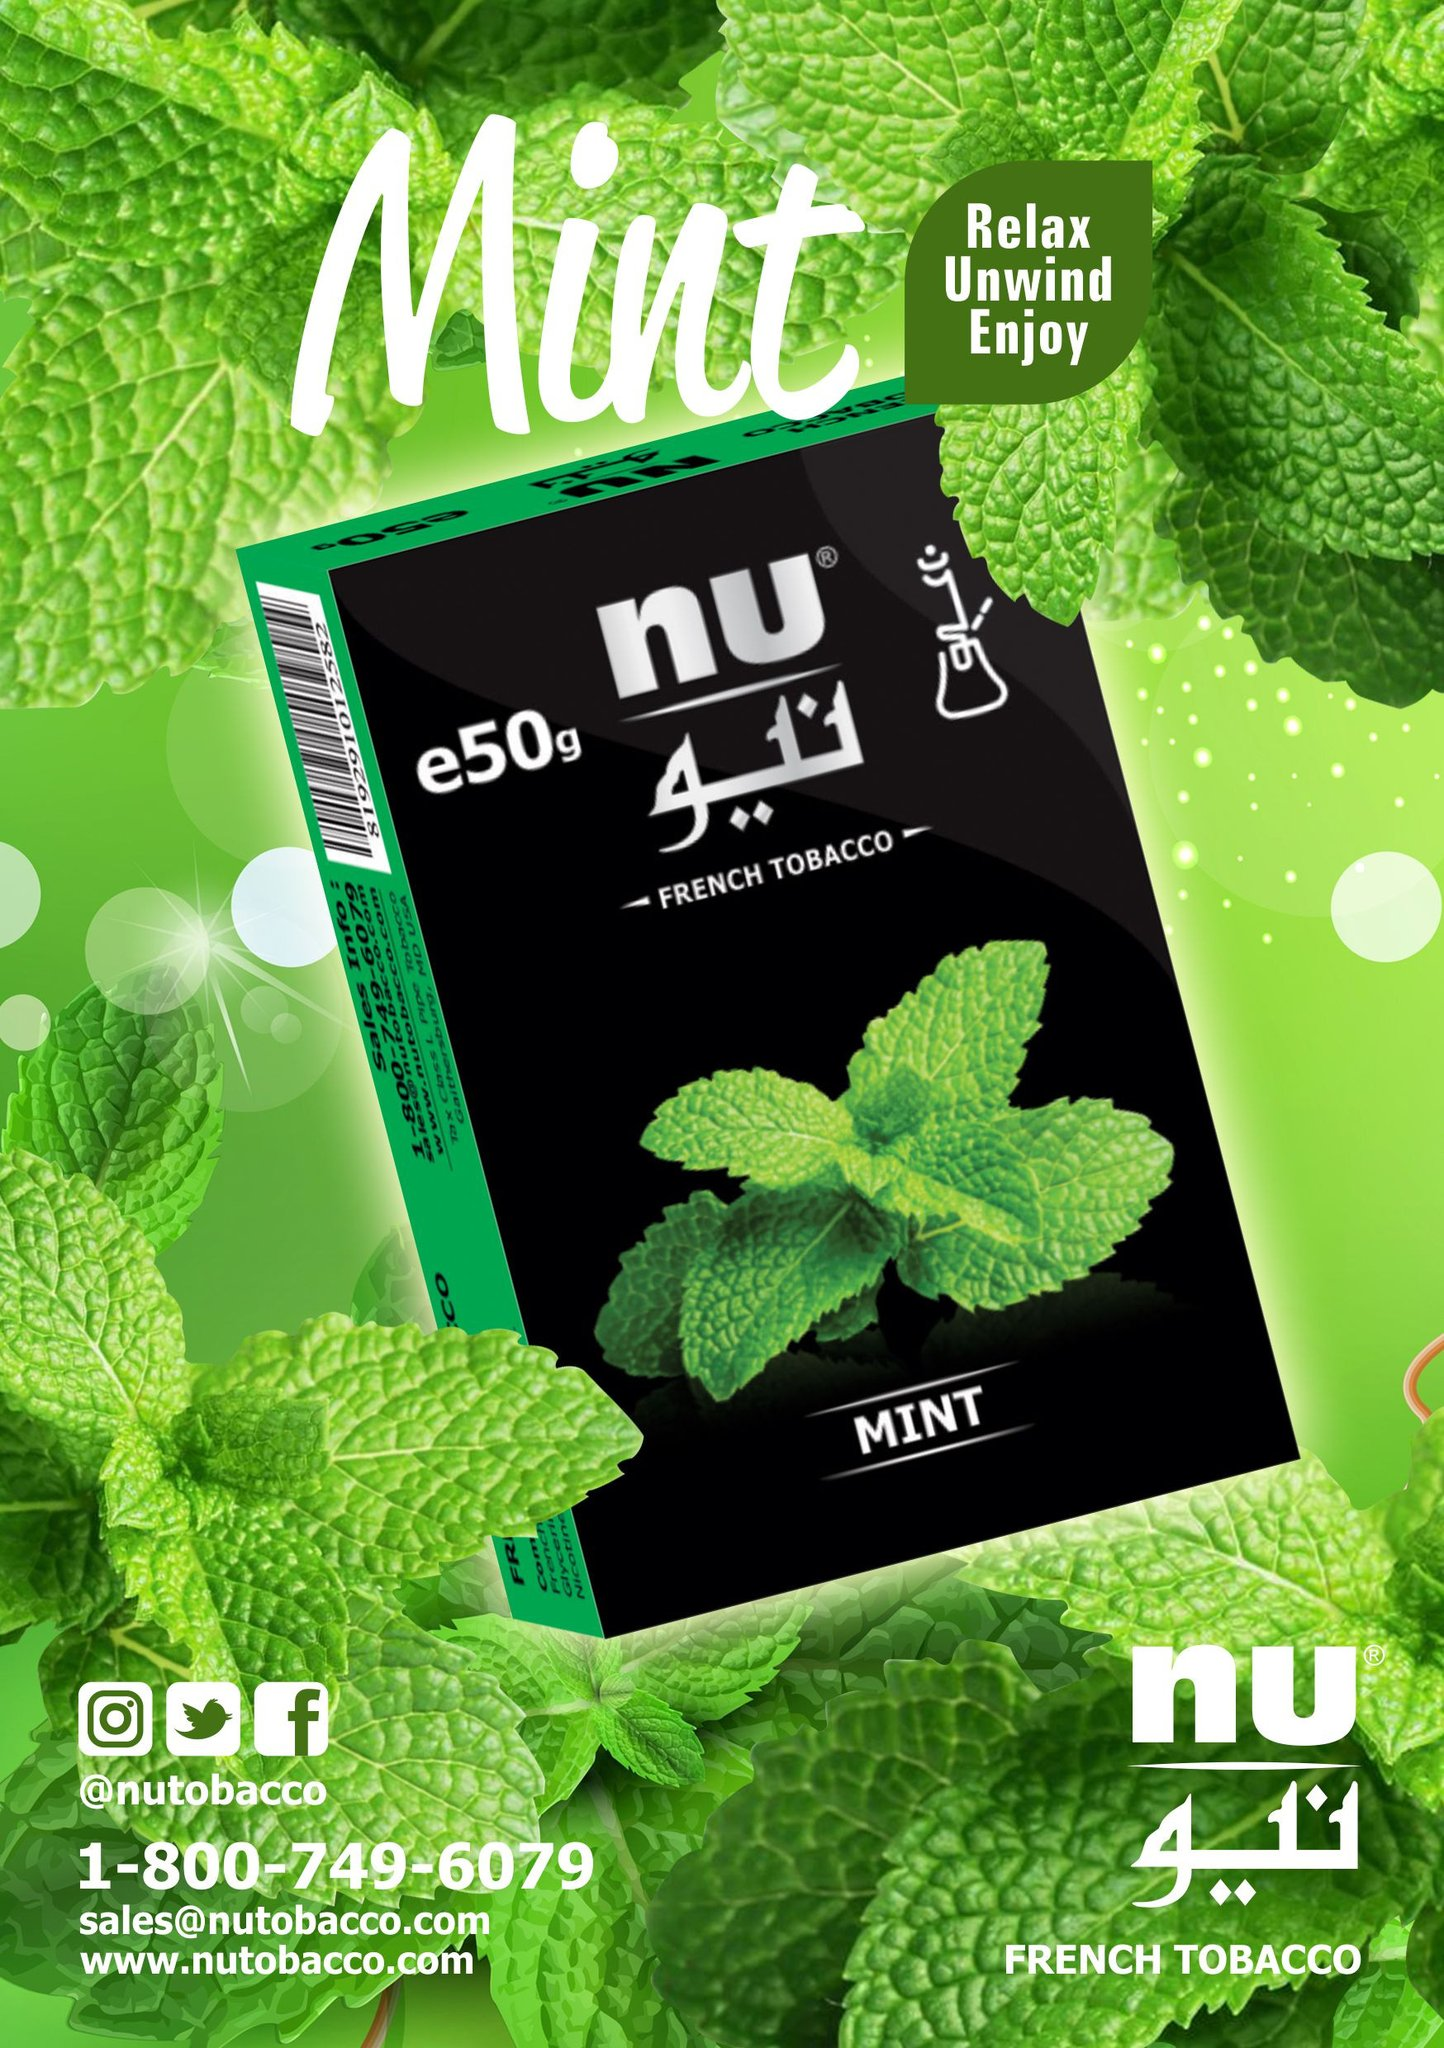 Nu Hookah / Mint(最近の良く出来た中東の会社のMint系、違いが細かすぎて分かりにくい)